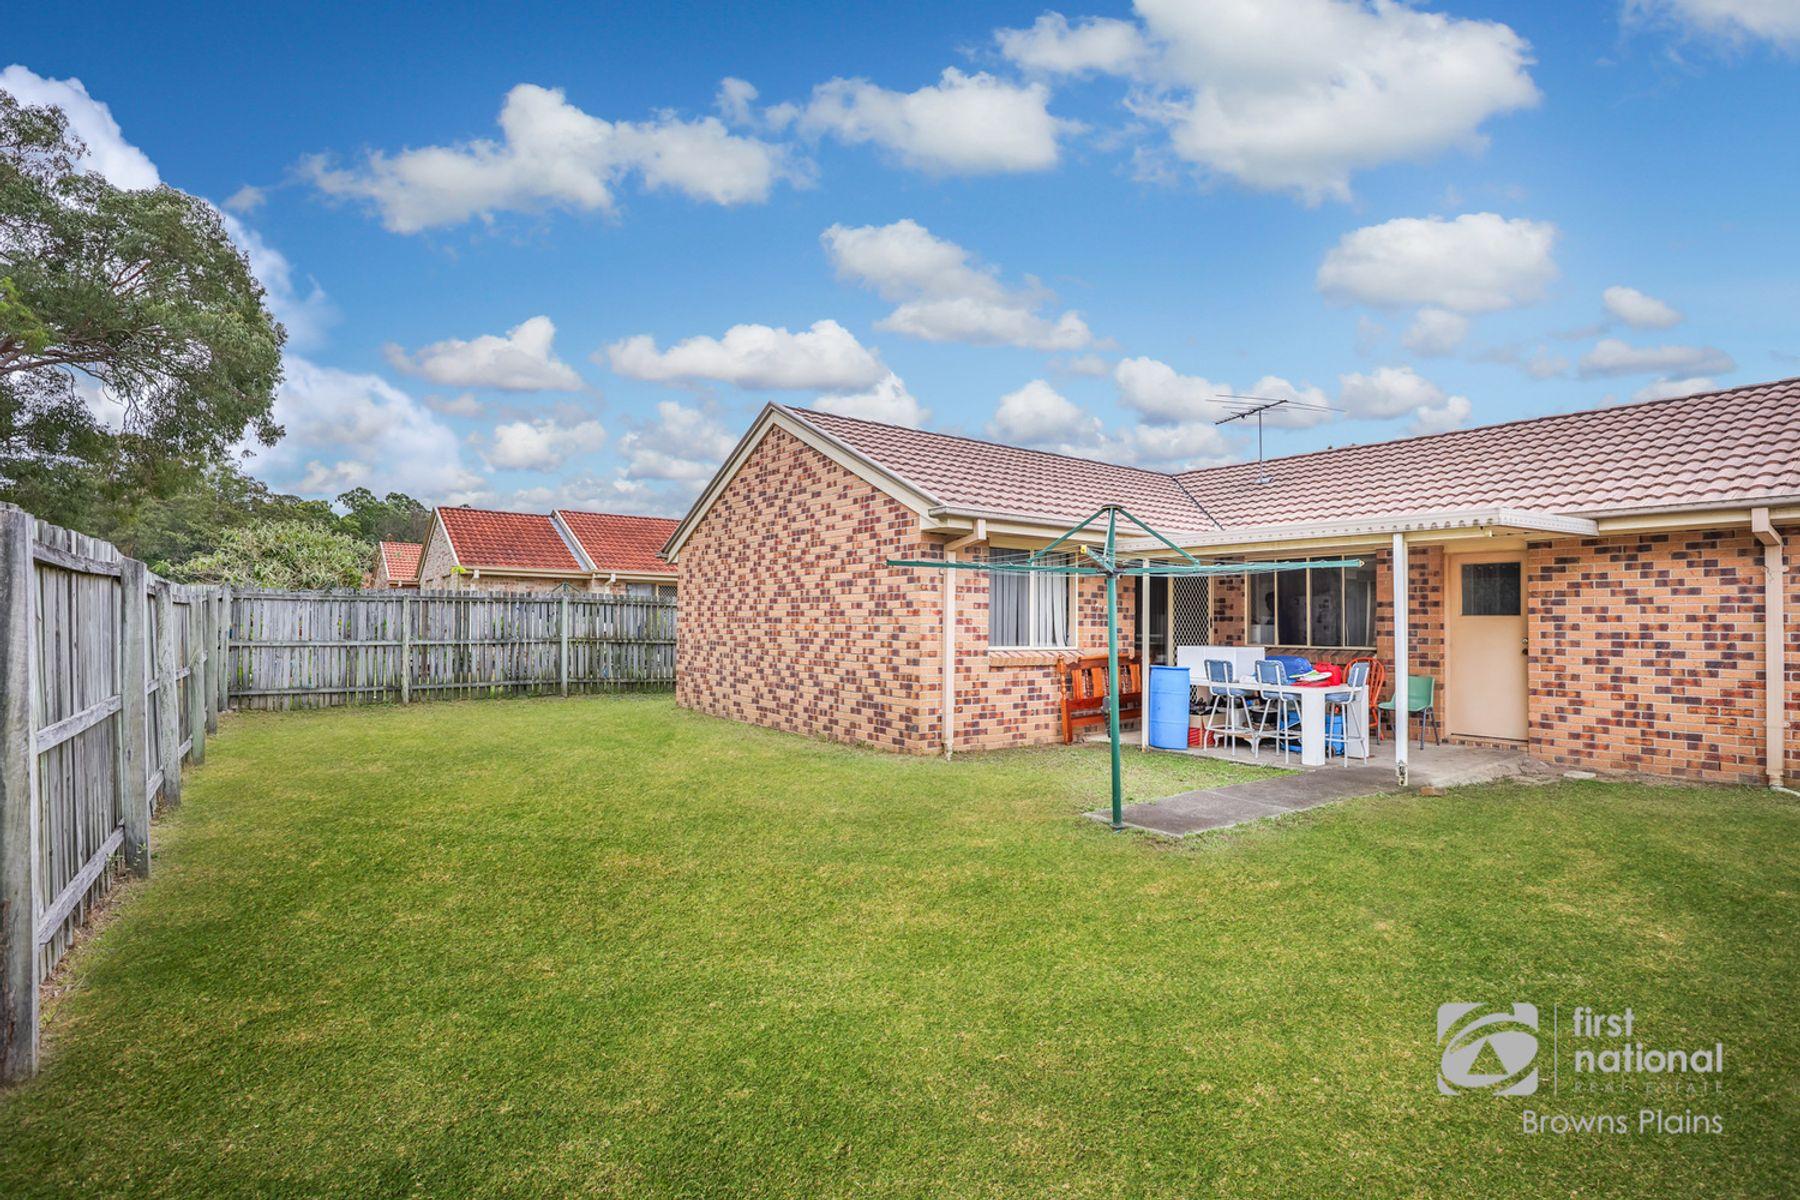 21 Oakwood Drive, Waterford West, QLD 4133